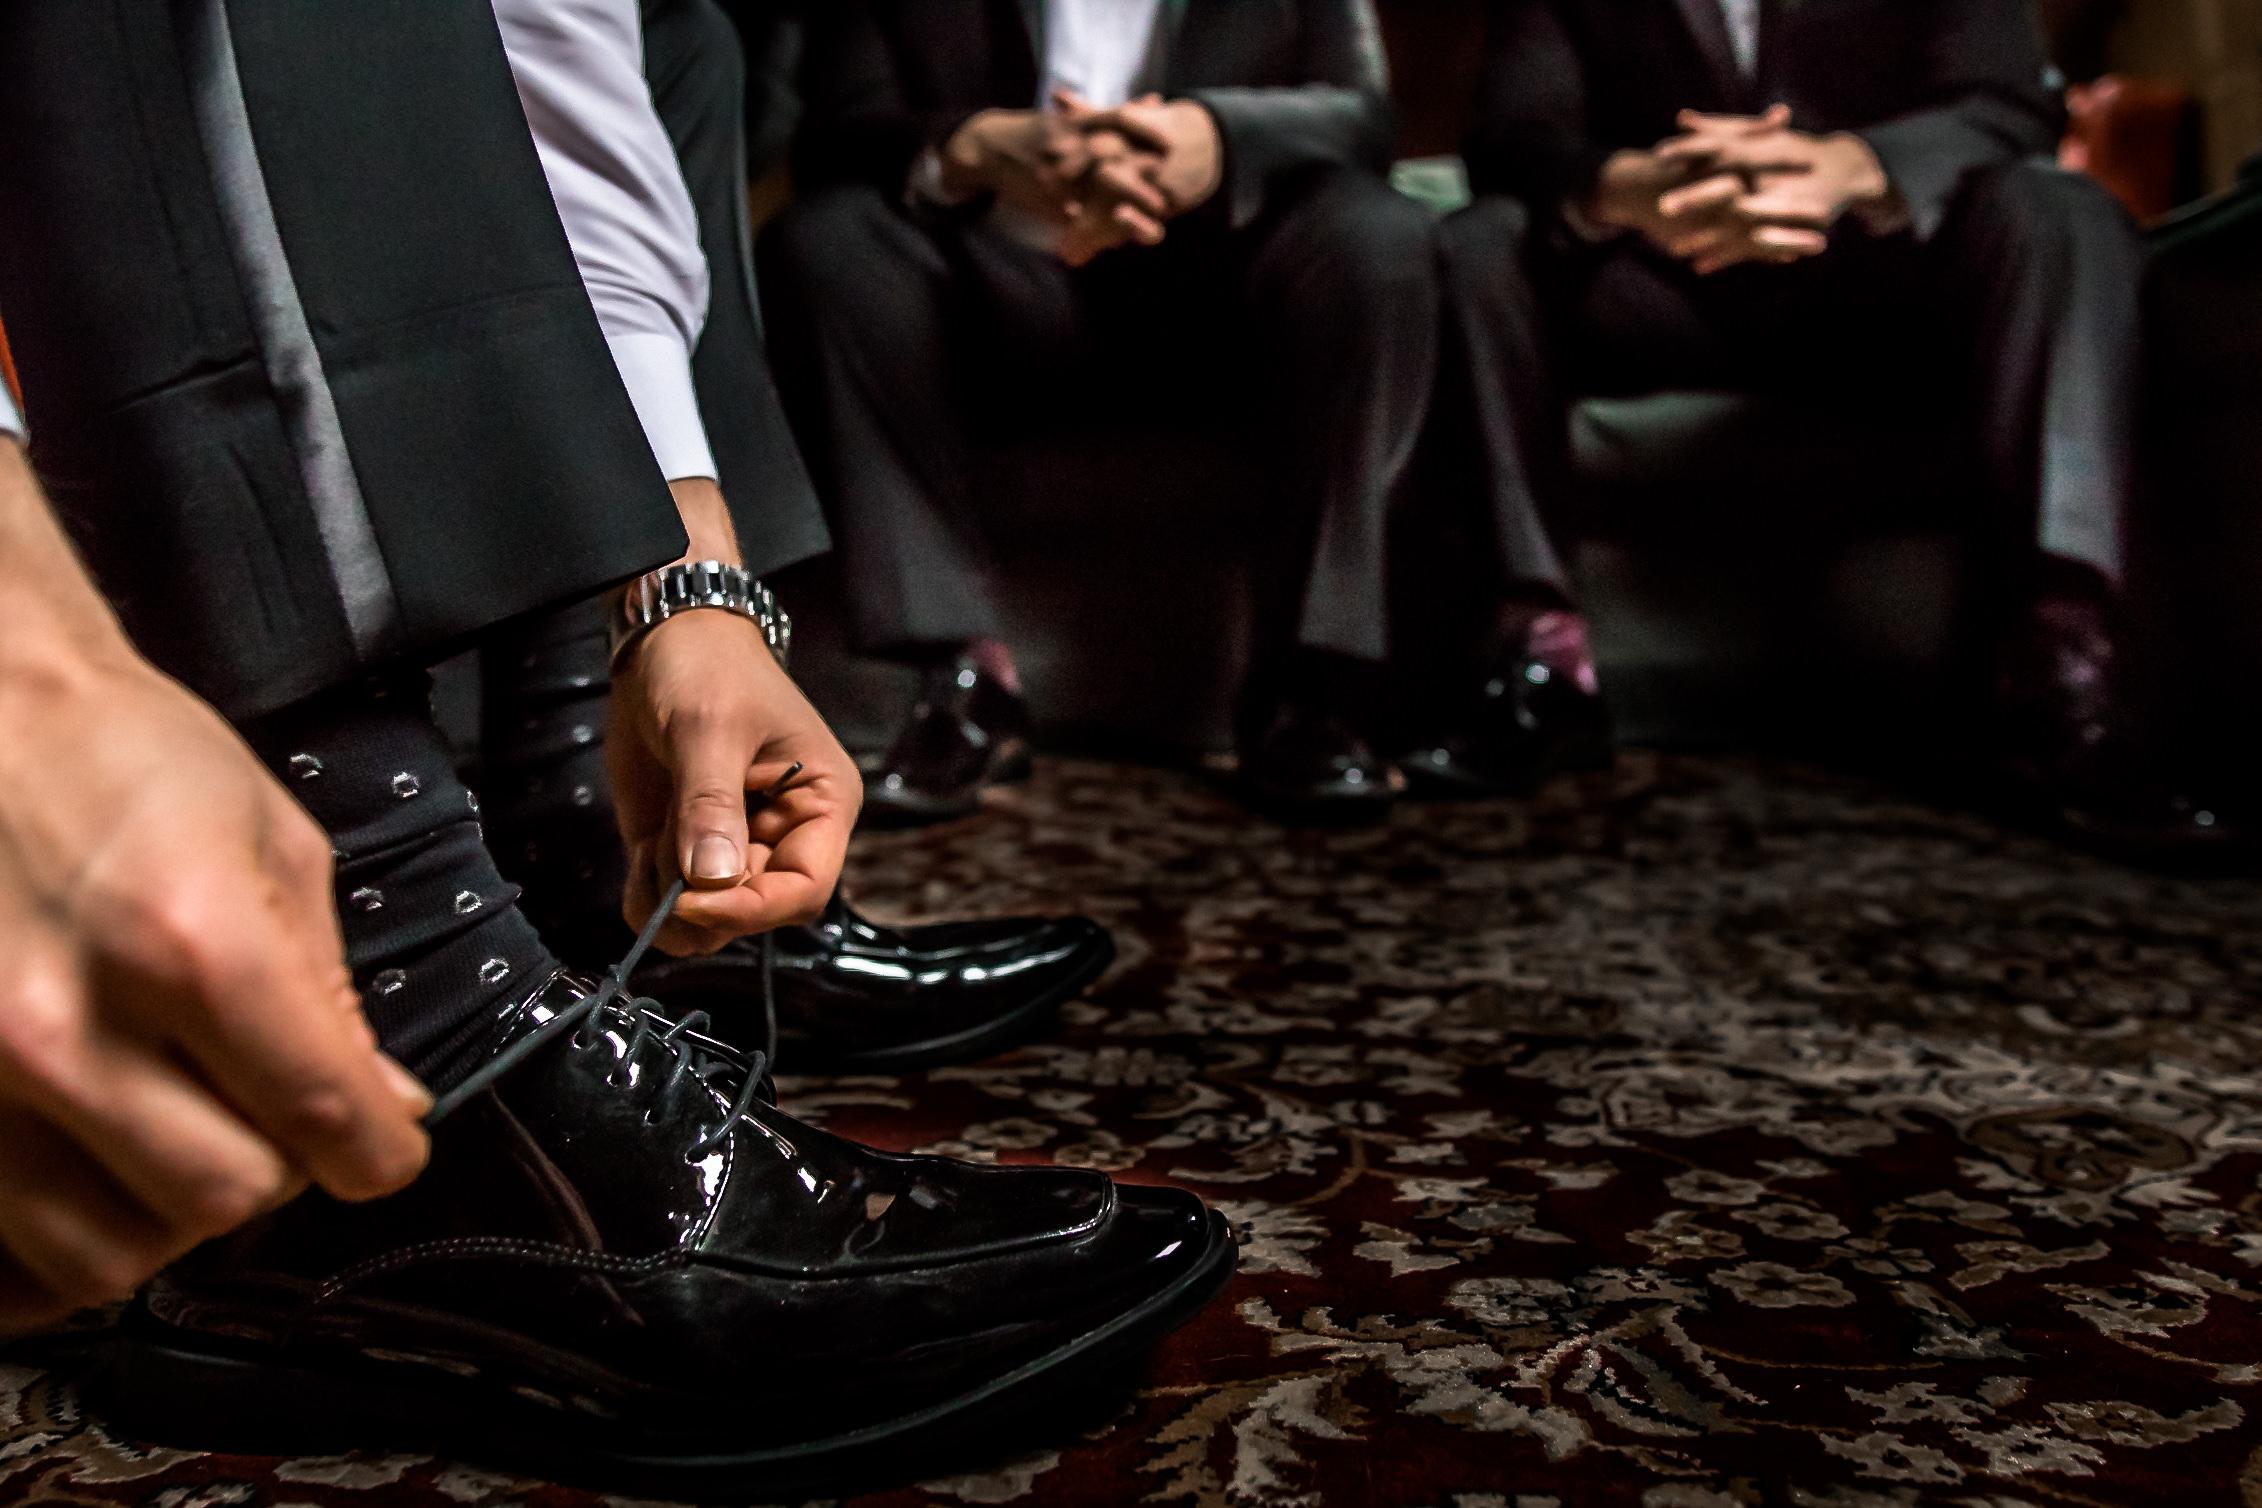 groom tying shoes groomsmen background details